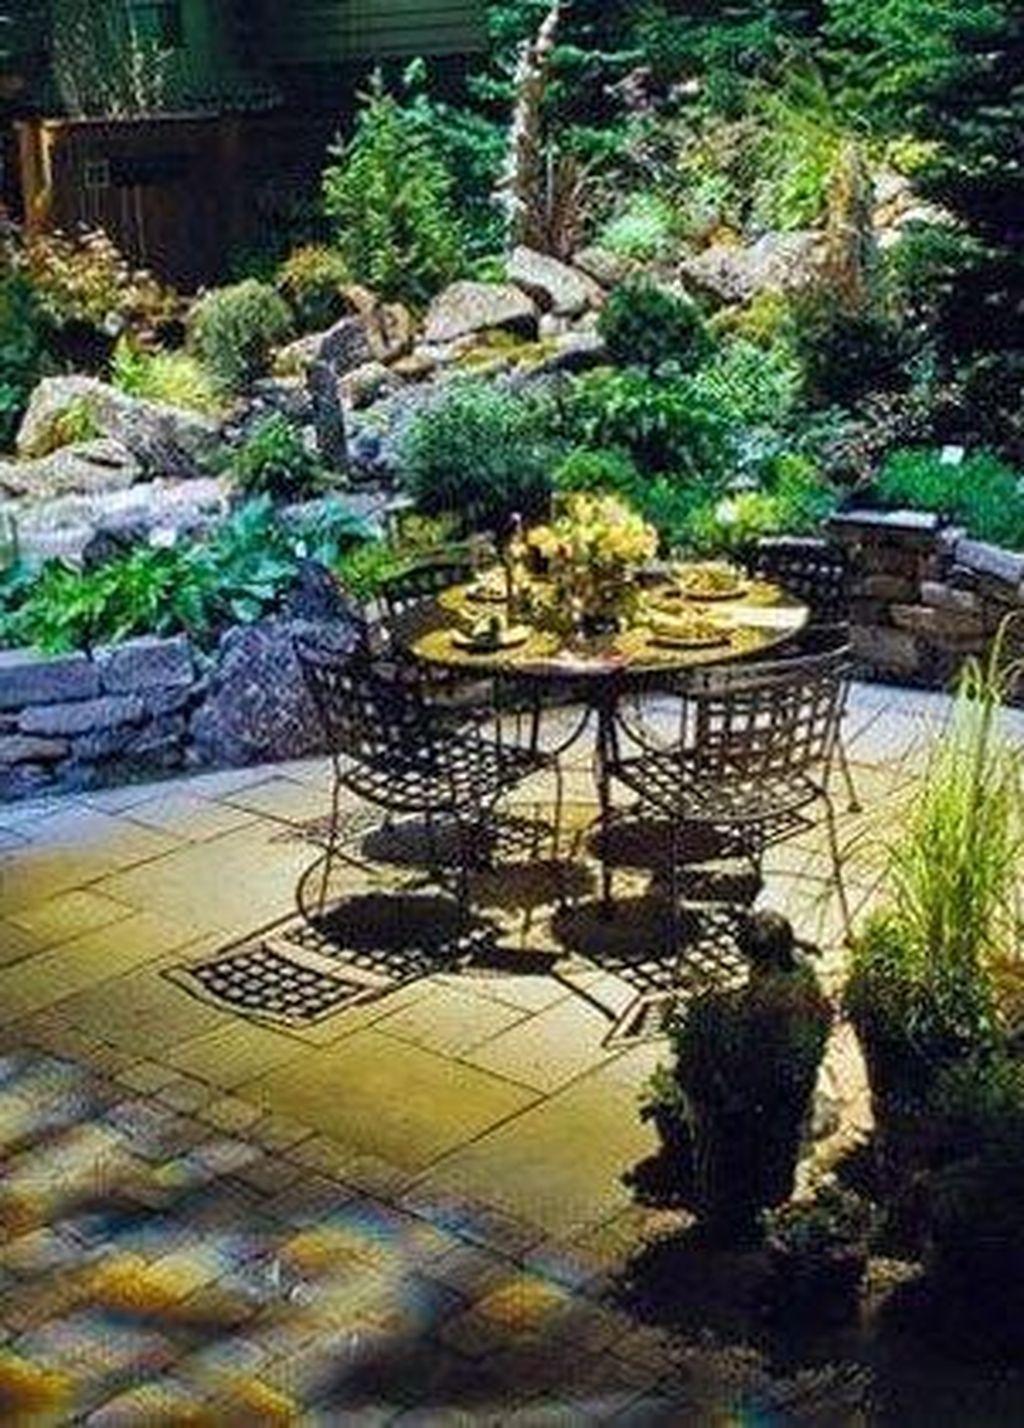 33 Charming Urban Backyard Oasis Design Ideas With Tropical Decor To Try In 2020 Urban Backyard Backyard Oasis Backyard